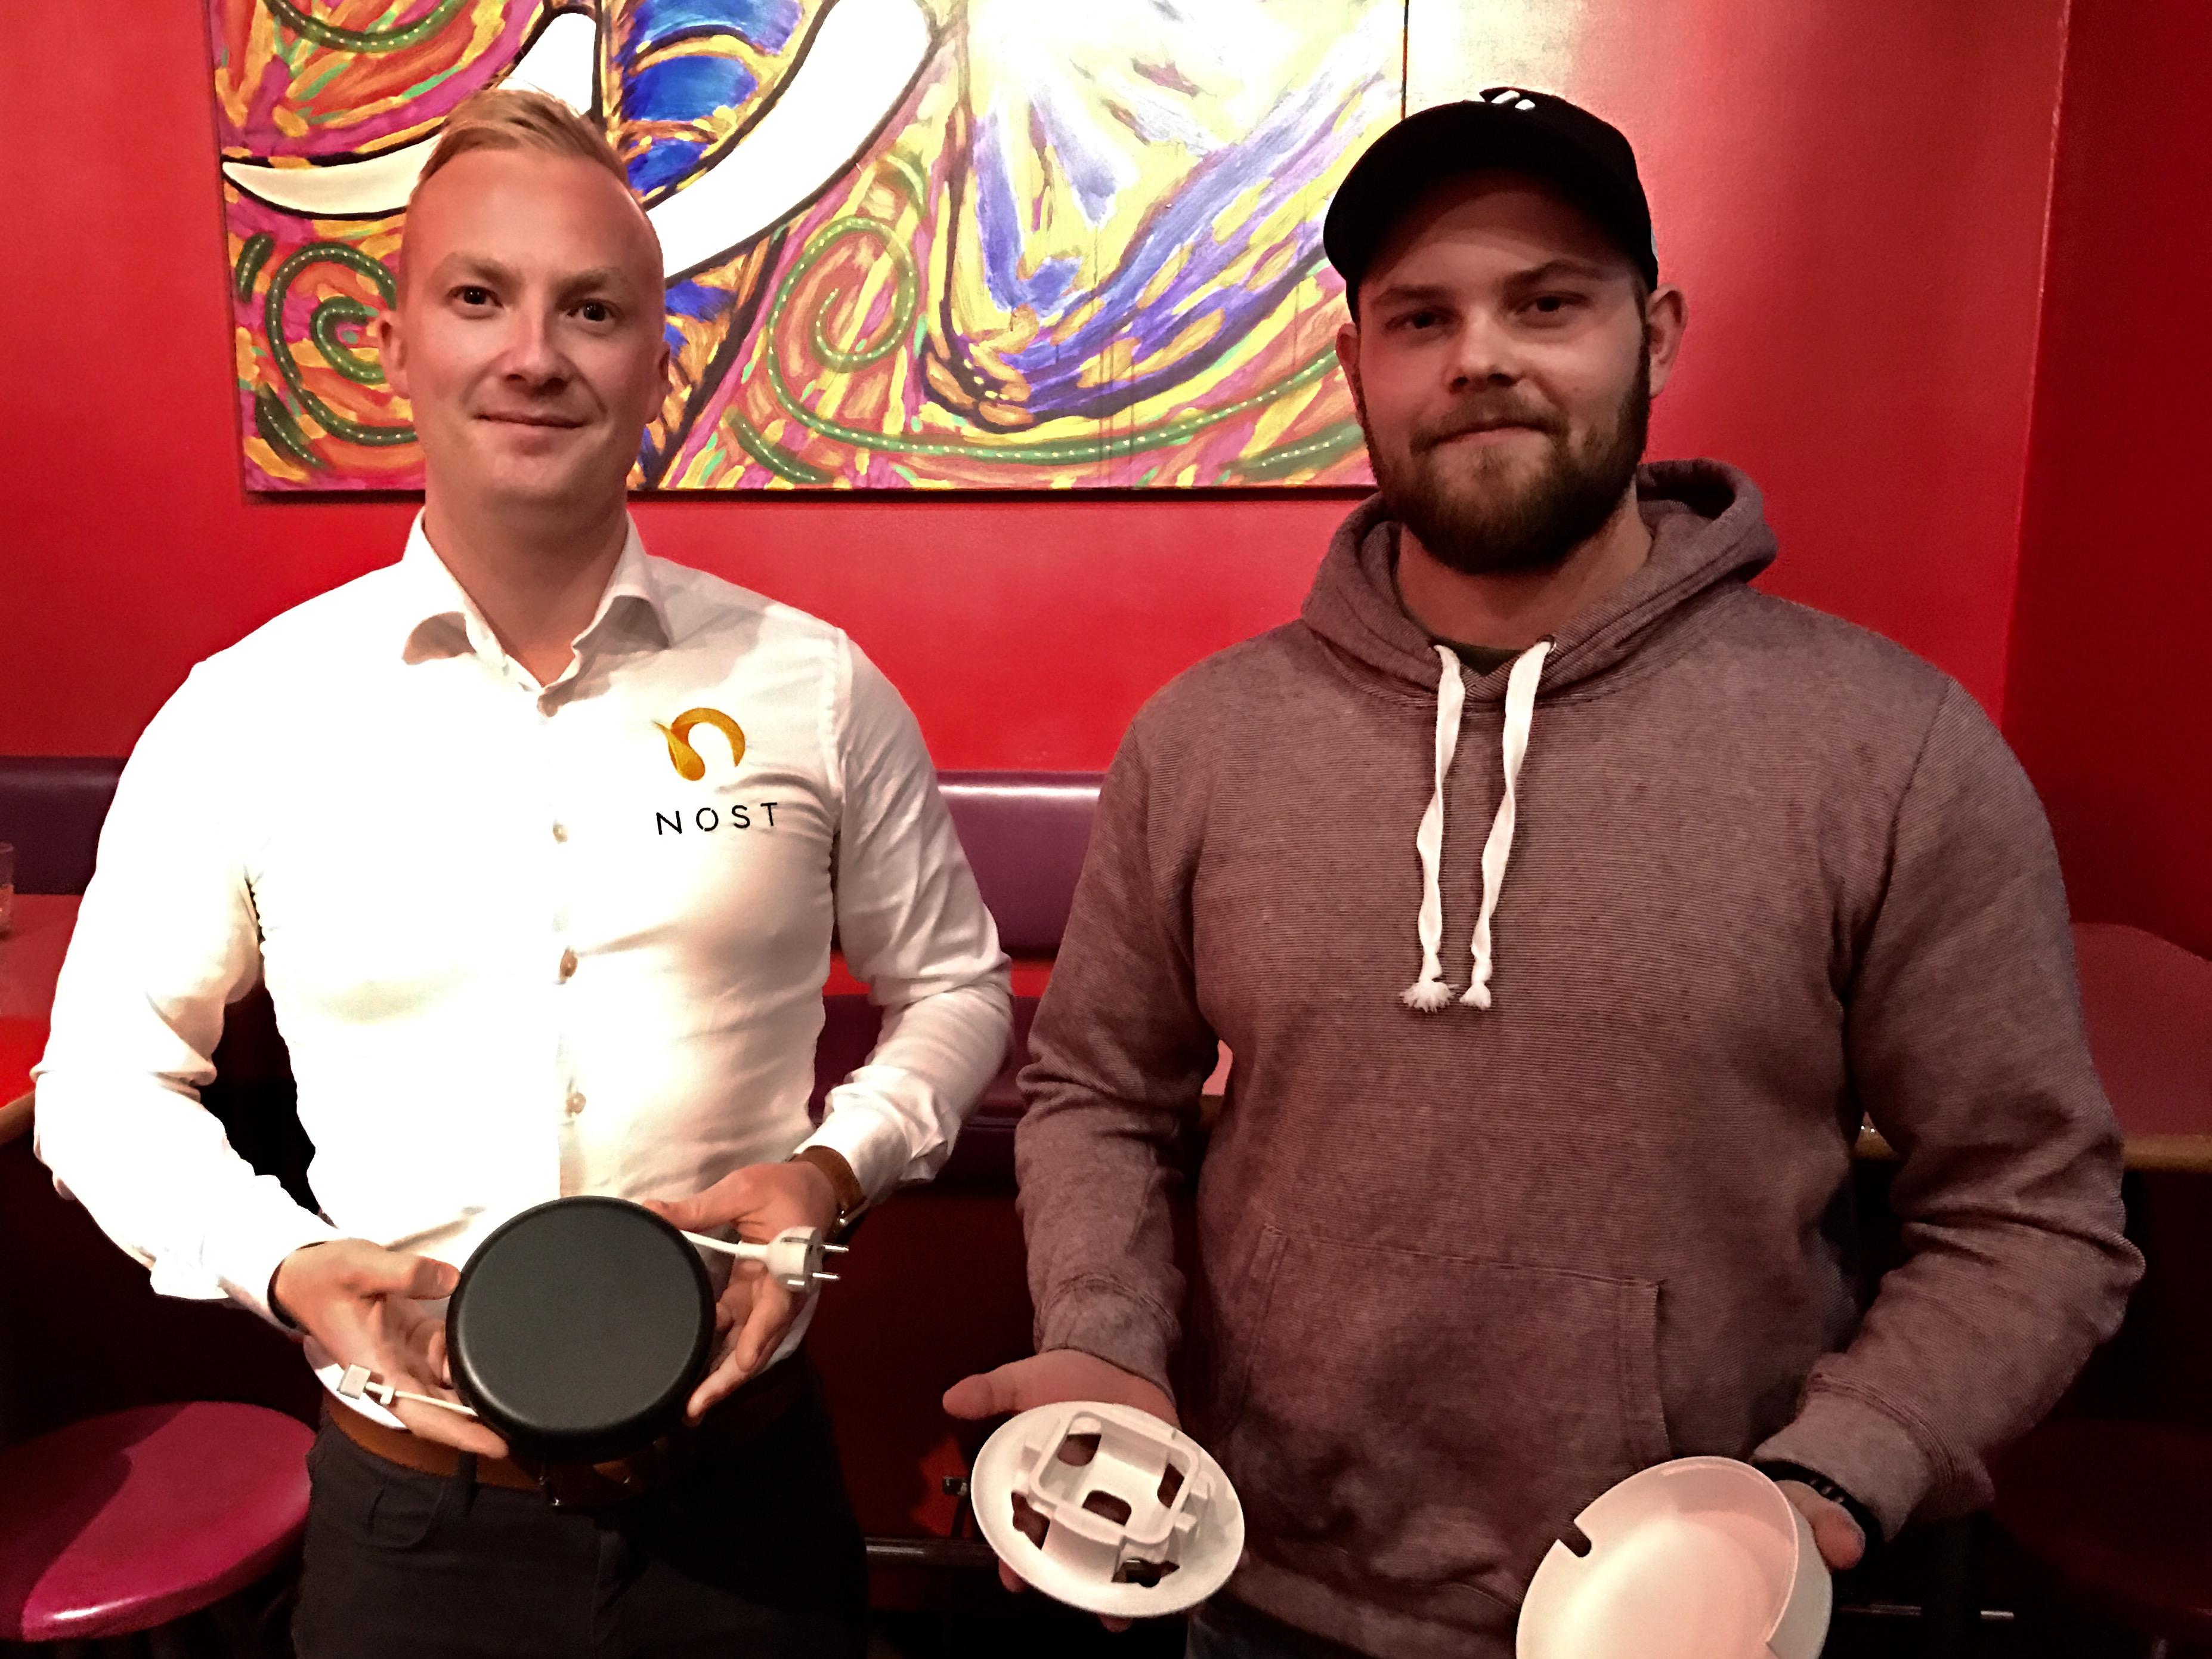 Jon Erik Stensrød til venstre og Sigvart Andersen. Nøst sin kabelnøster til MacBook Pro og Air lanseres 25. november til 299 kroner. (Ill.: Trond Bie/ITavisen)